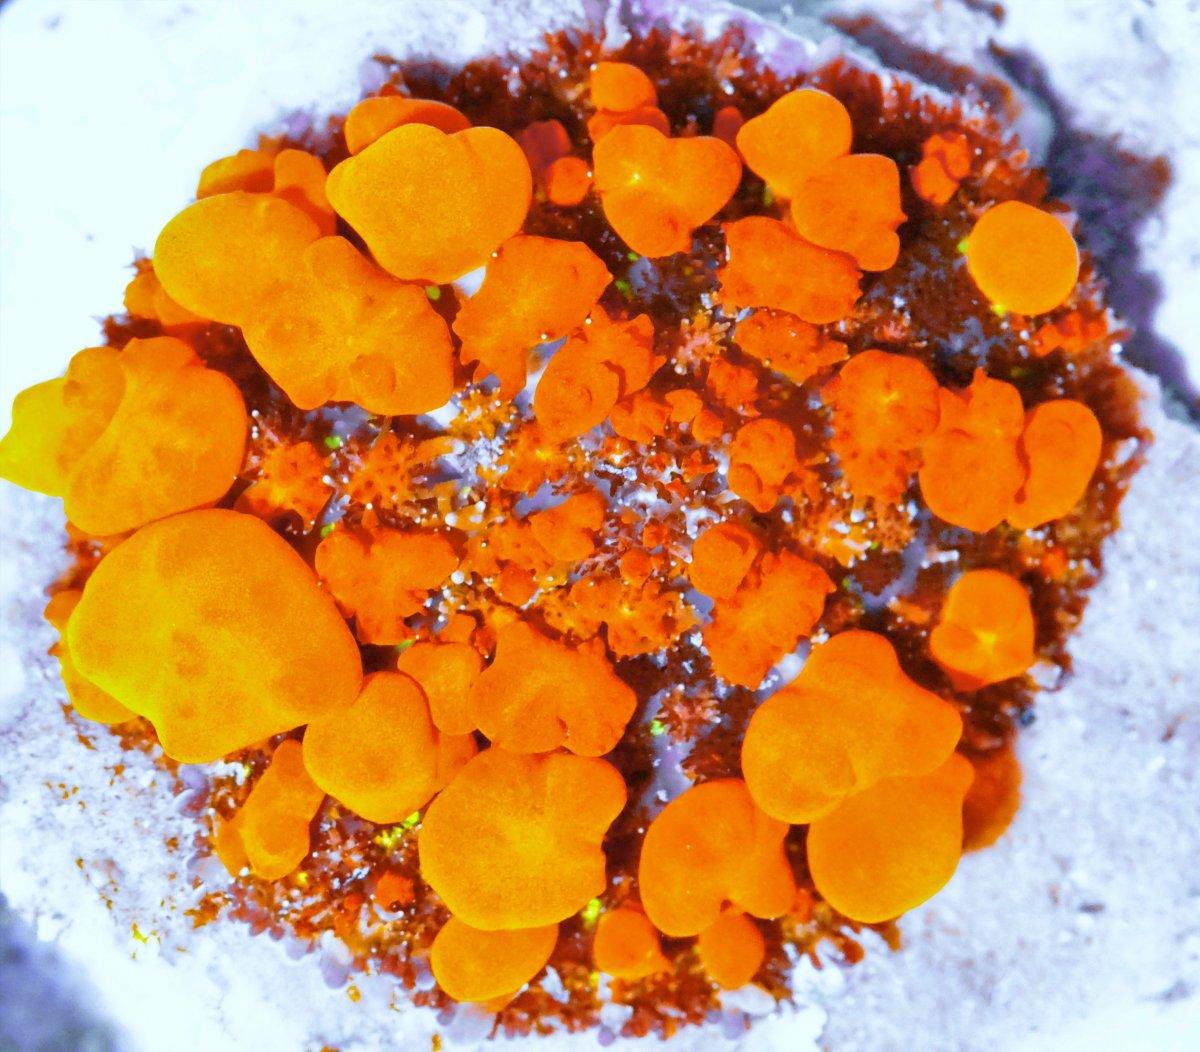 Incredible Super Orange Mother Bounce Uncut 125 1800.JPG